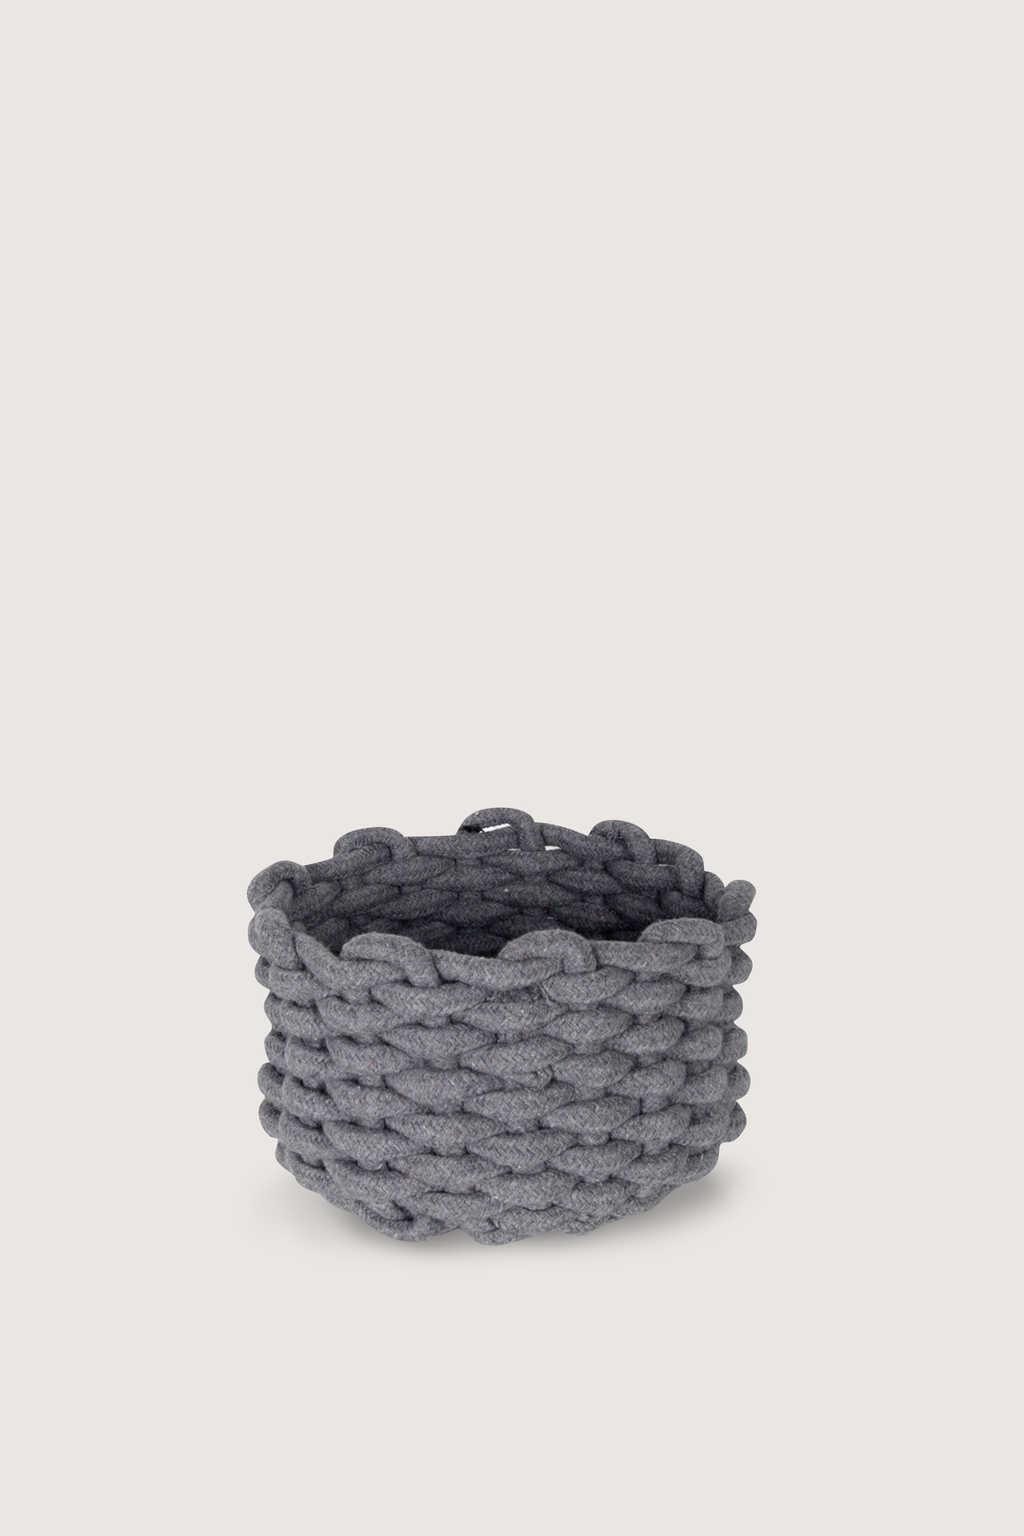 Small Woven Rope Bin 1018 Gray 1